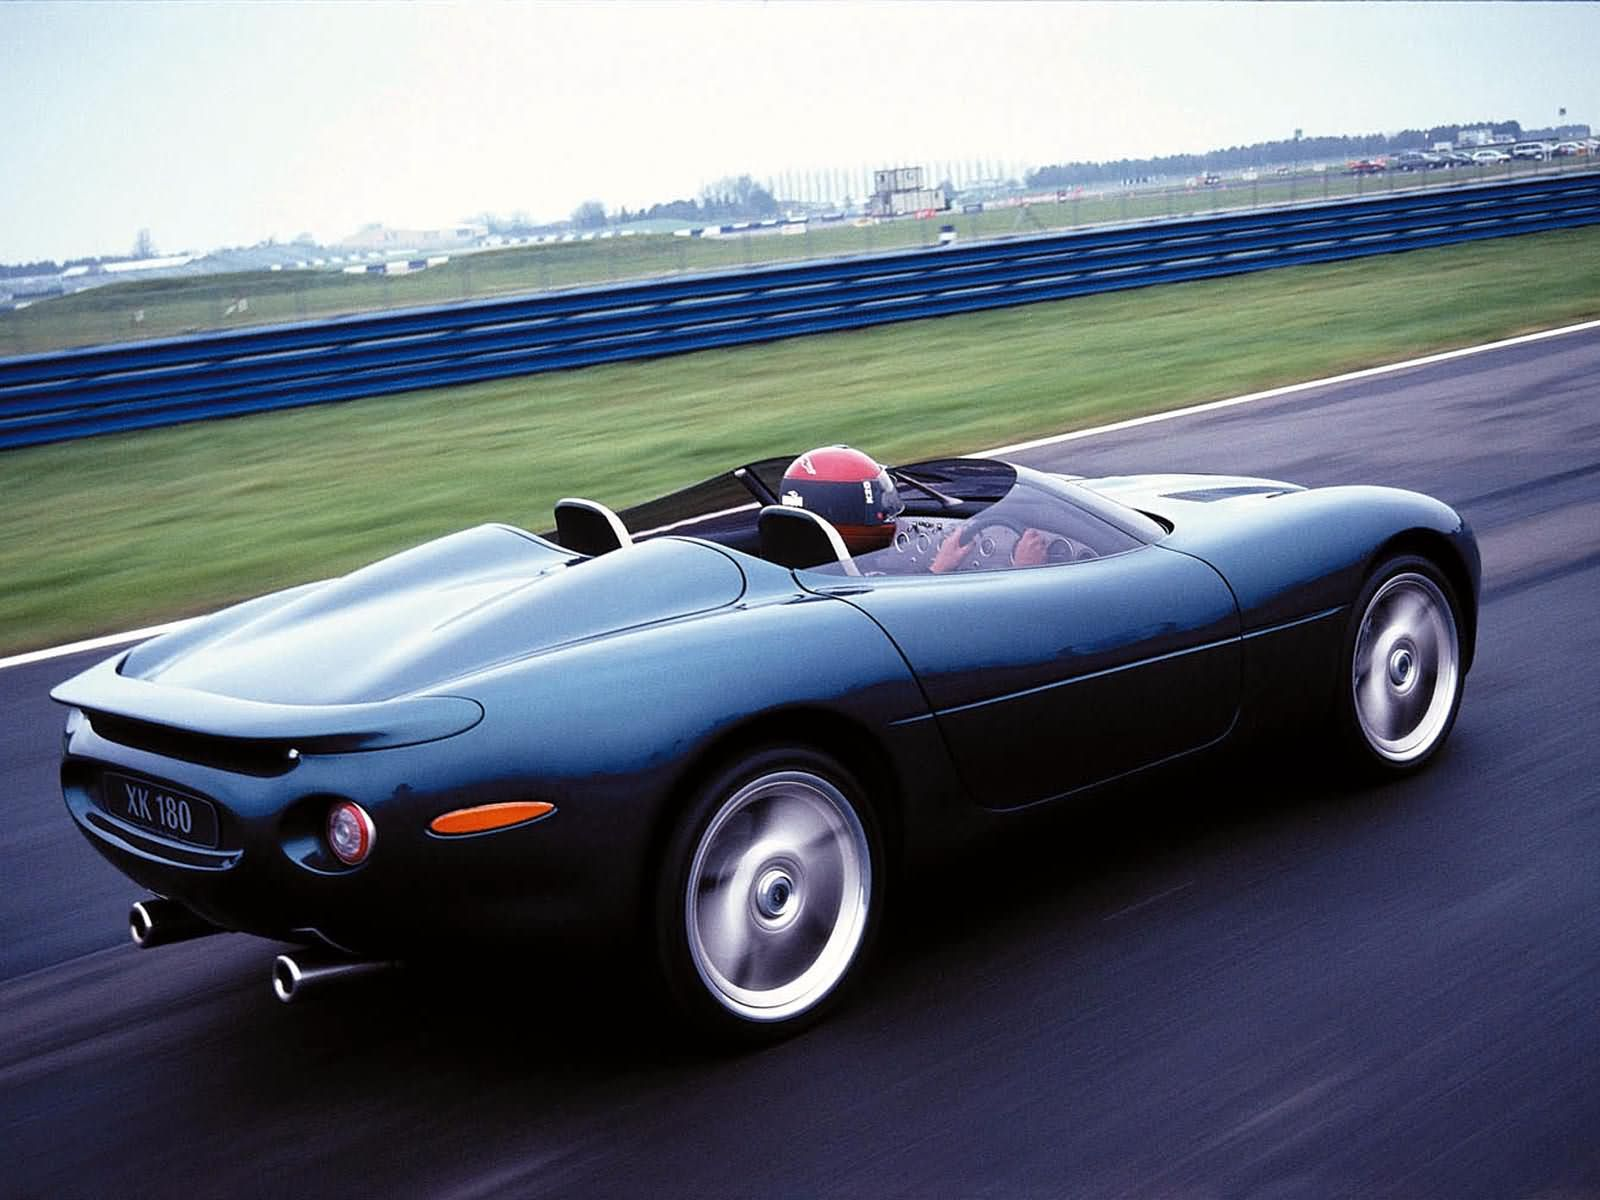 Vehicle · U002798 Jaguar XK180 Concept